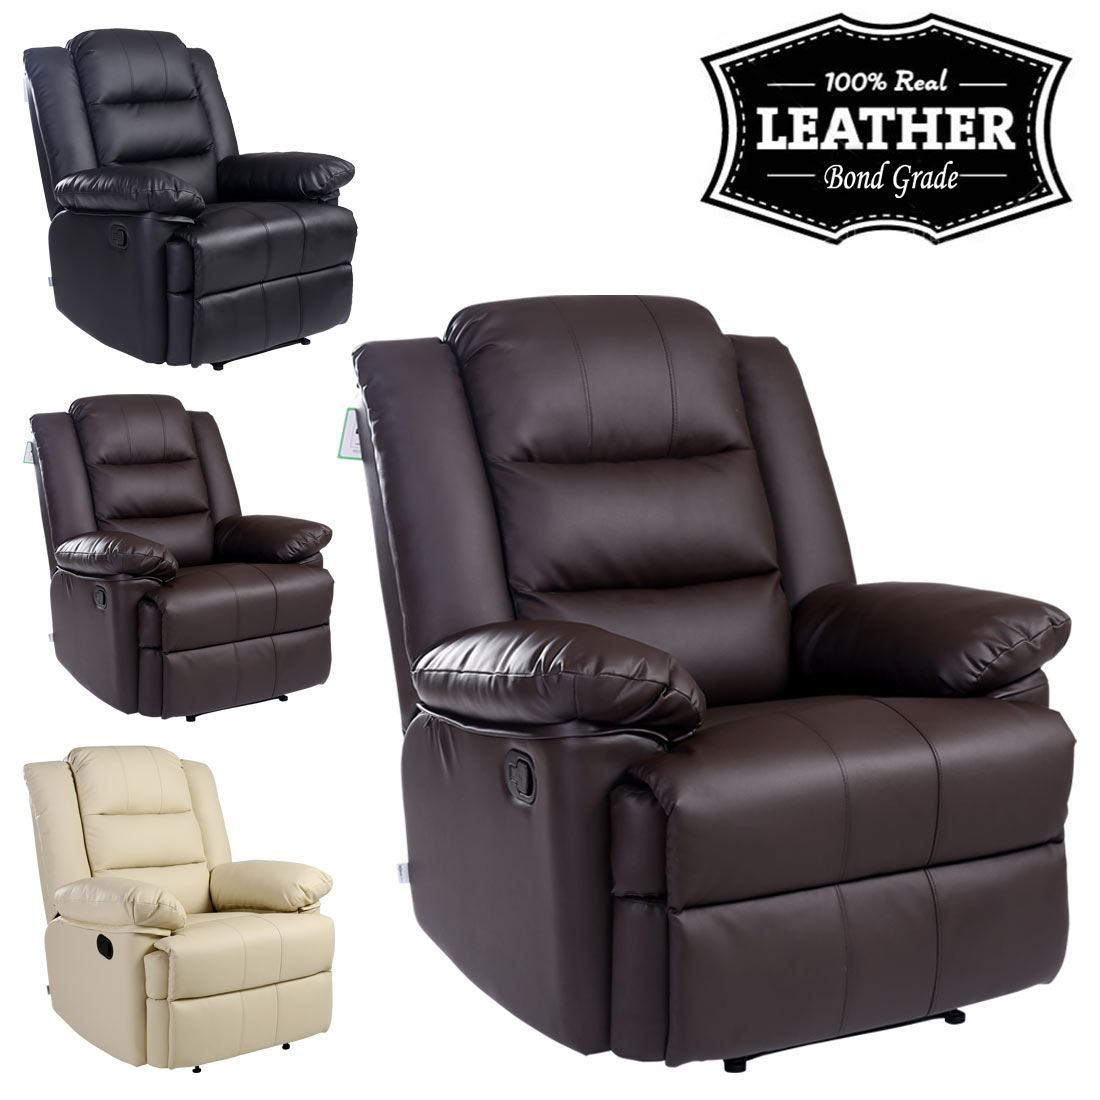 Lexington Leather Couch